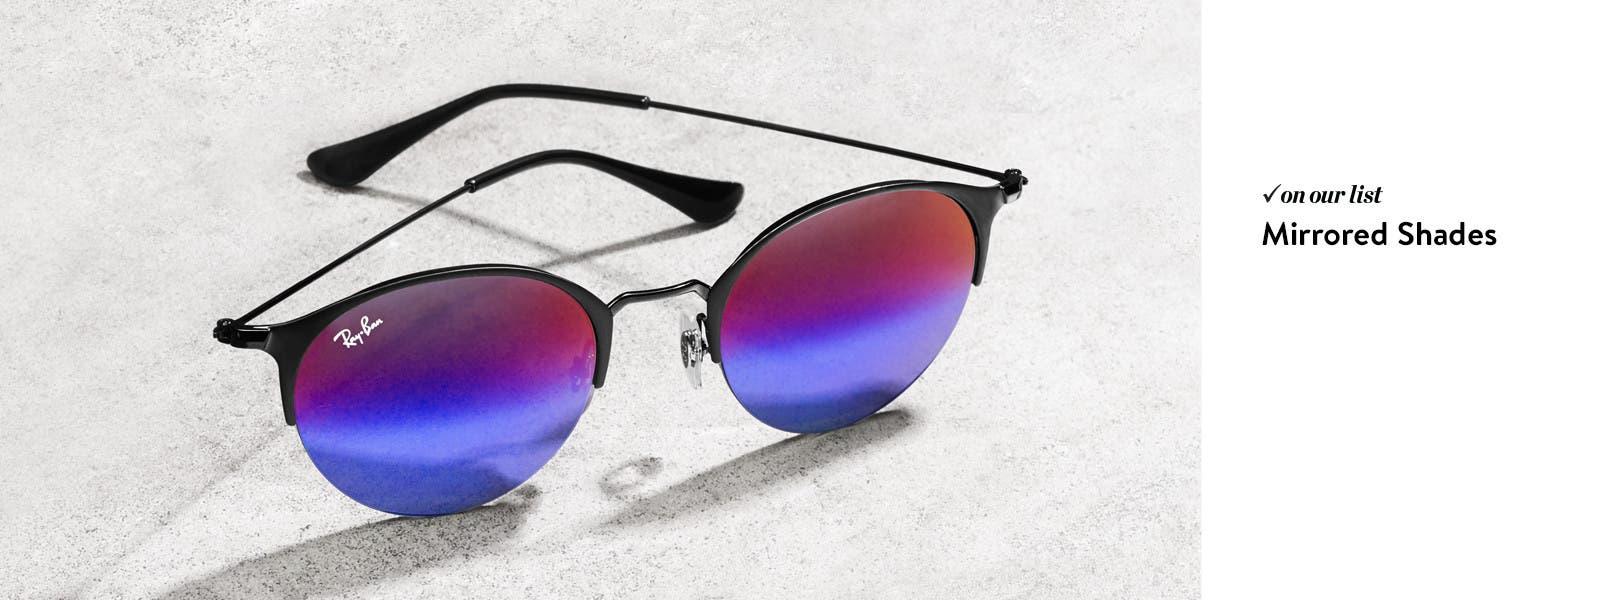 Mirrored shades.